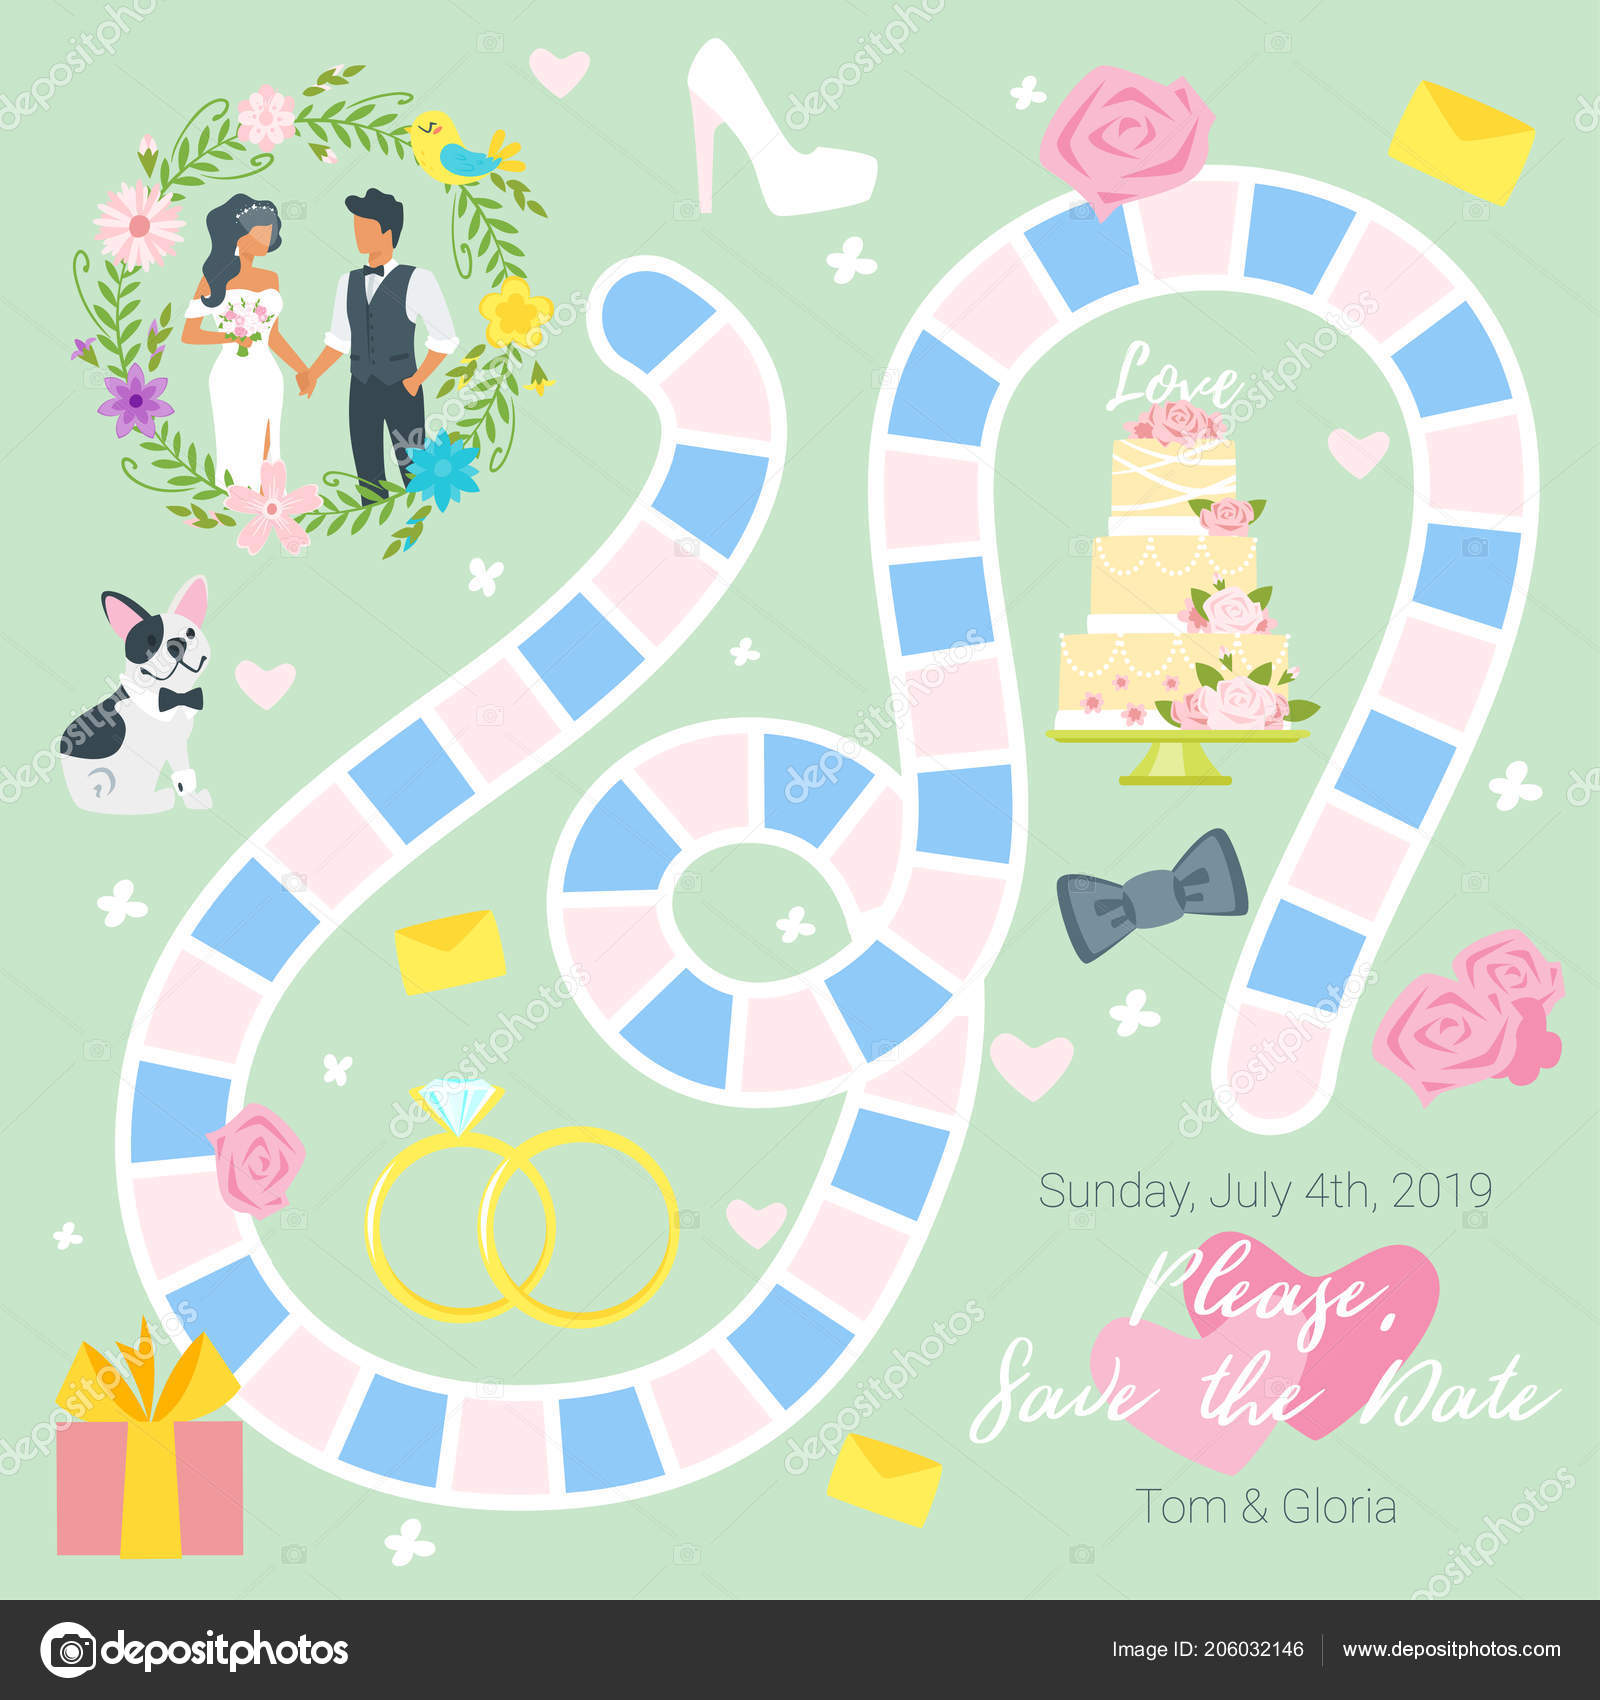 wedding board game template stock vector tkronalter9 gmail com